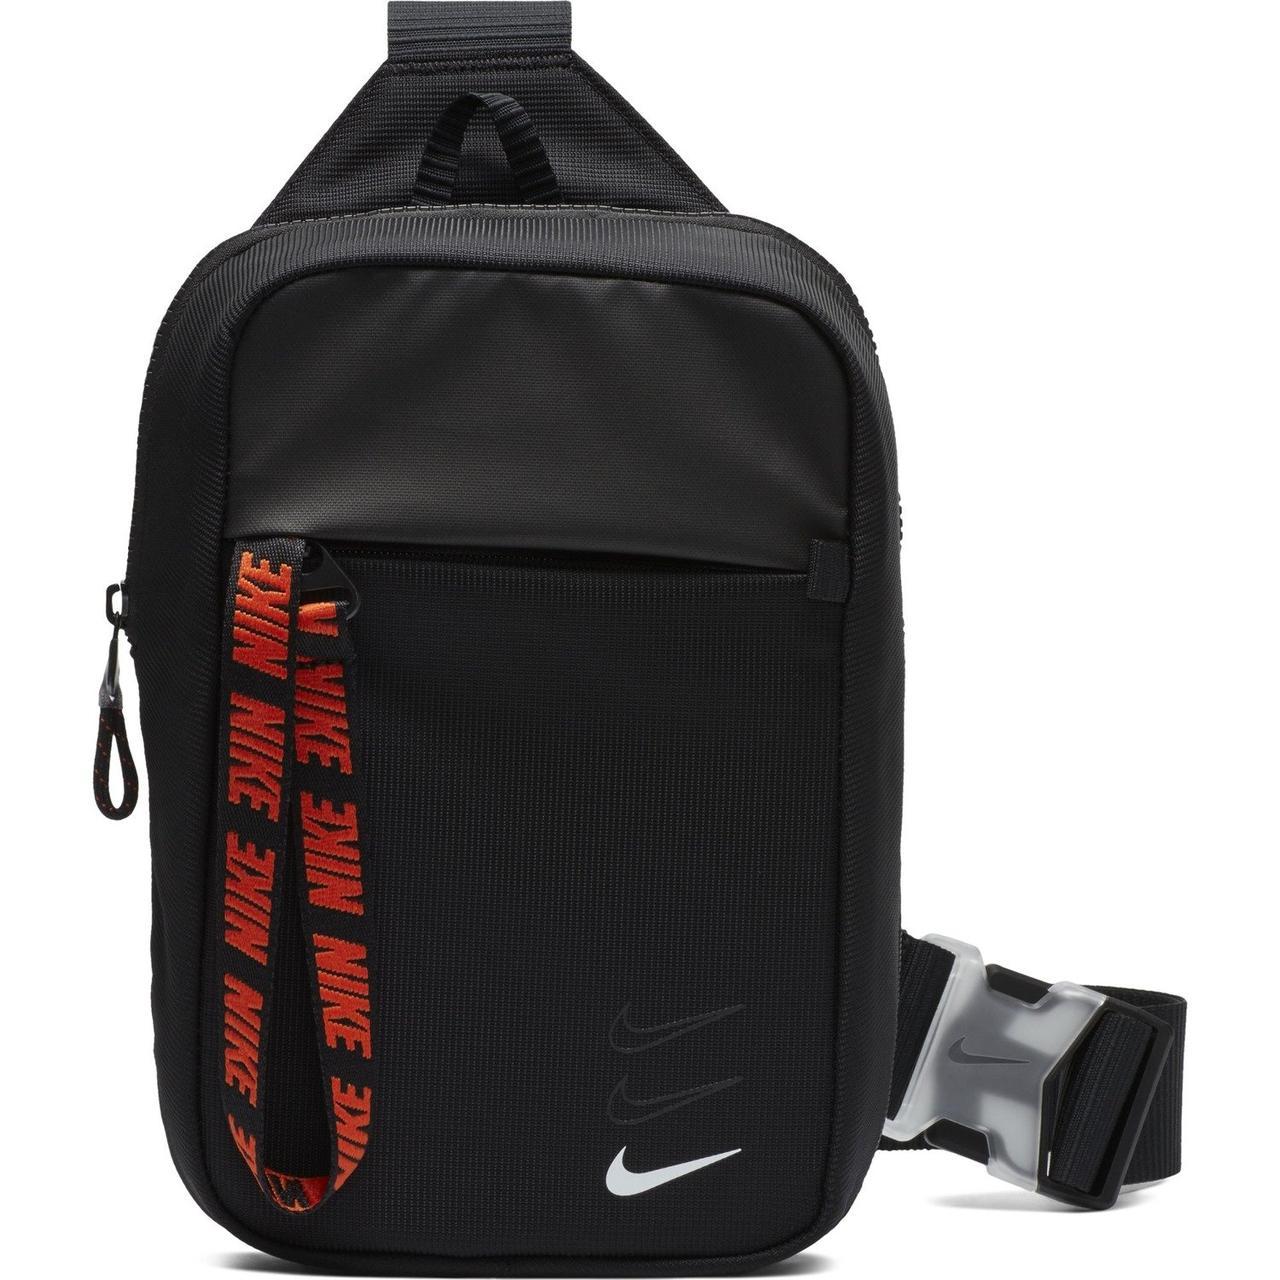 Сумка Nike Advance Essentials 3.0 BA6144-010 Черный